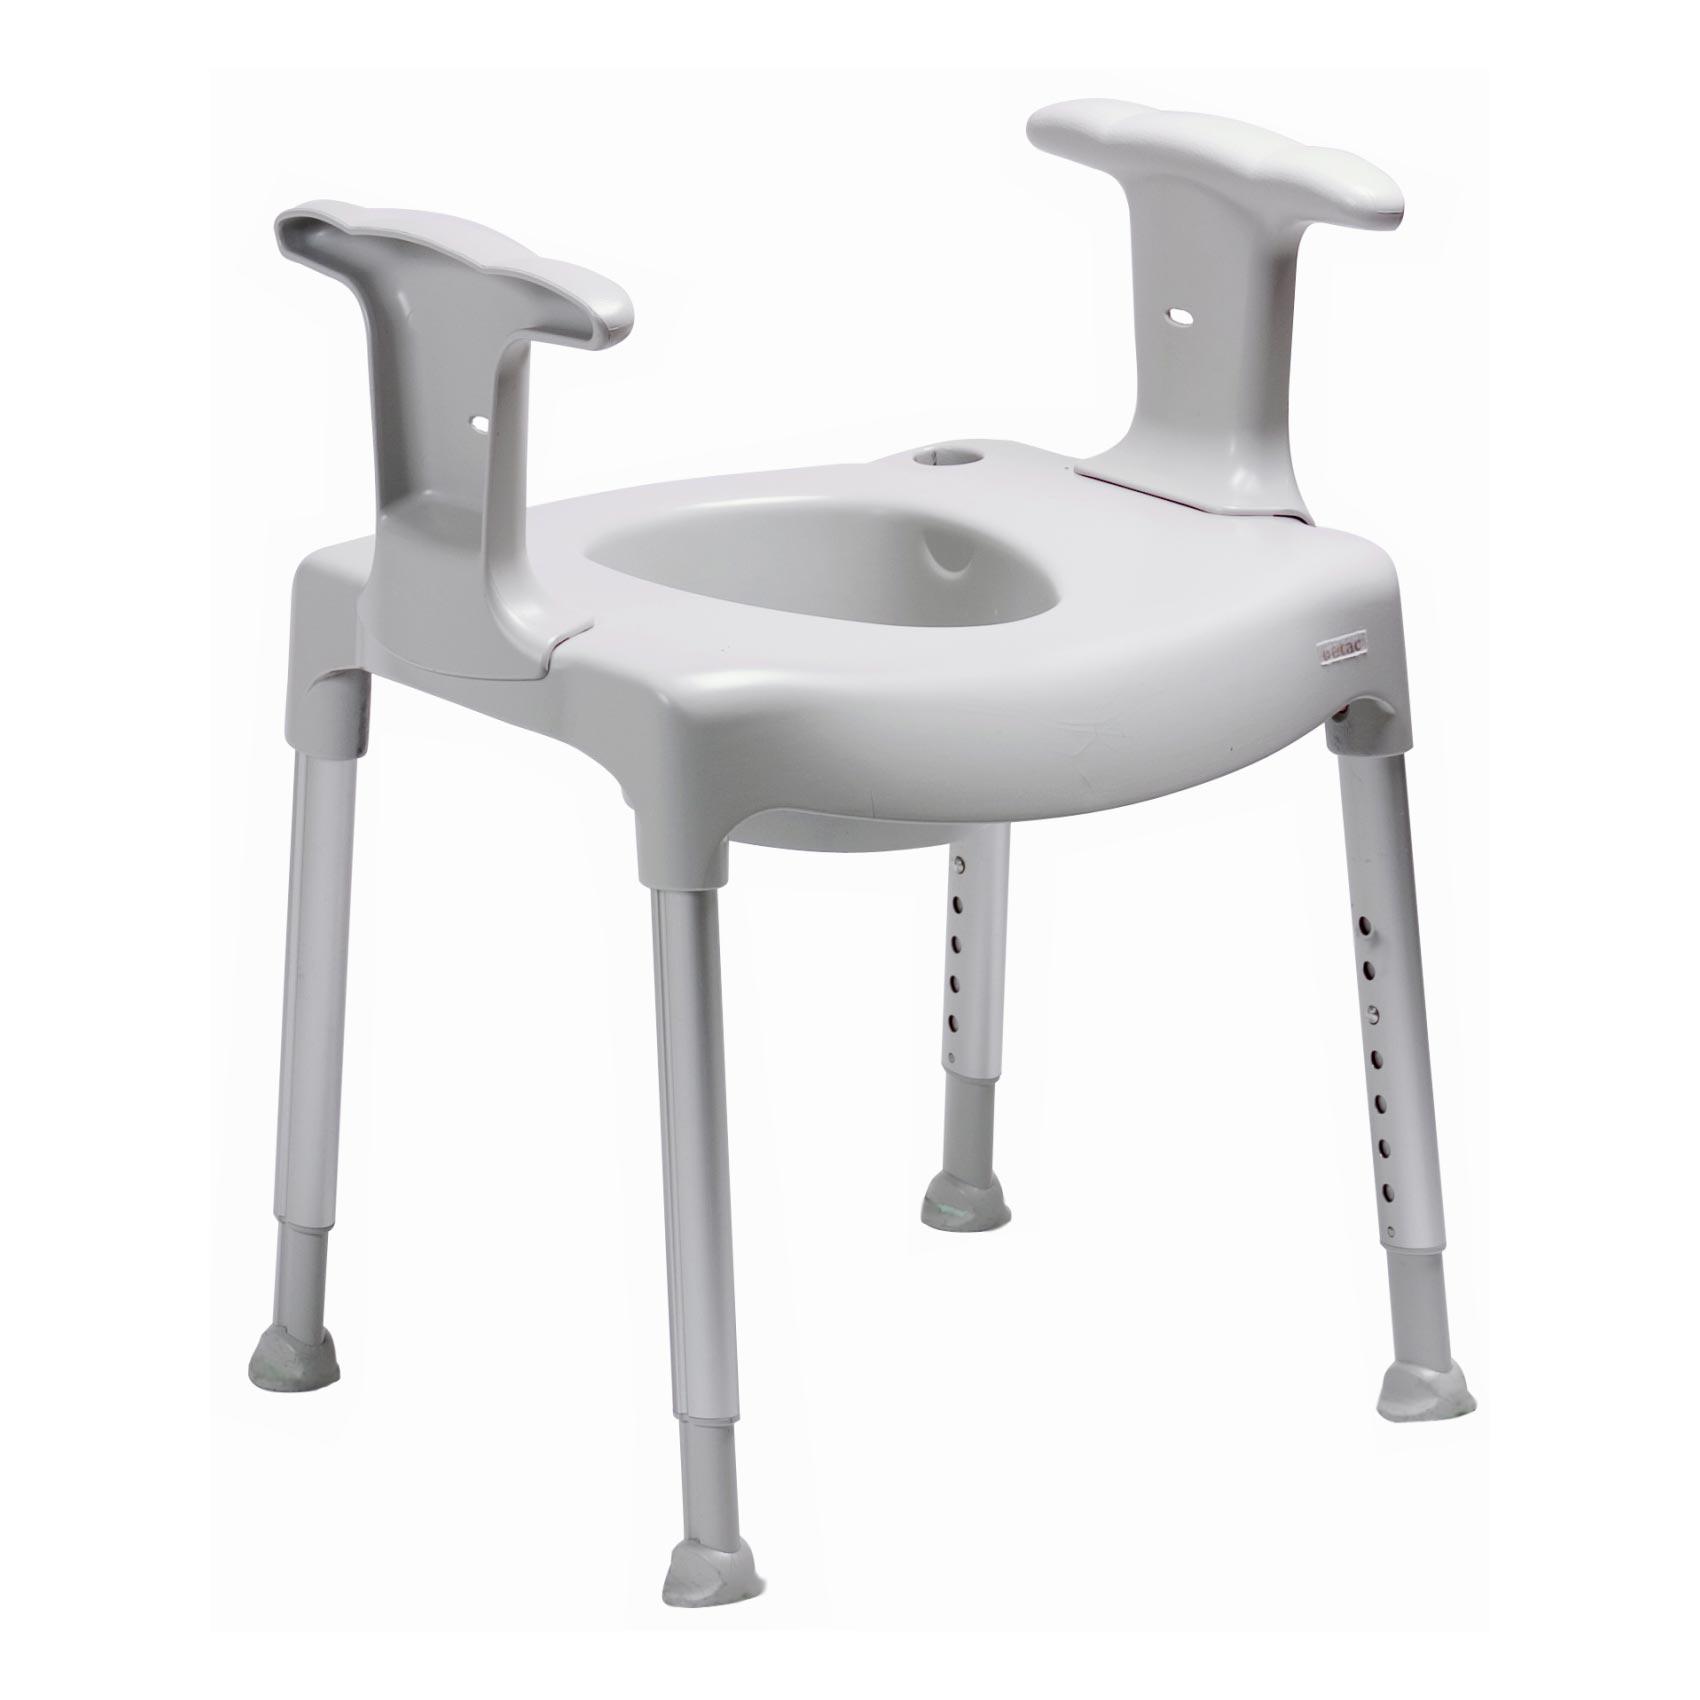 Etac Swift freestanding toilet seat raiser